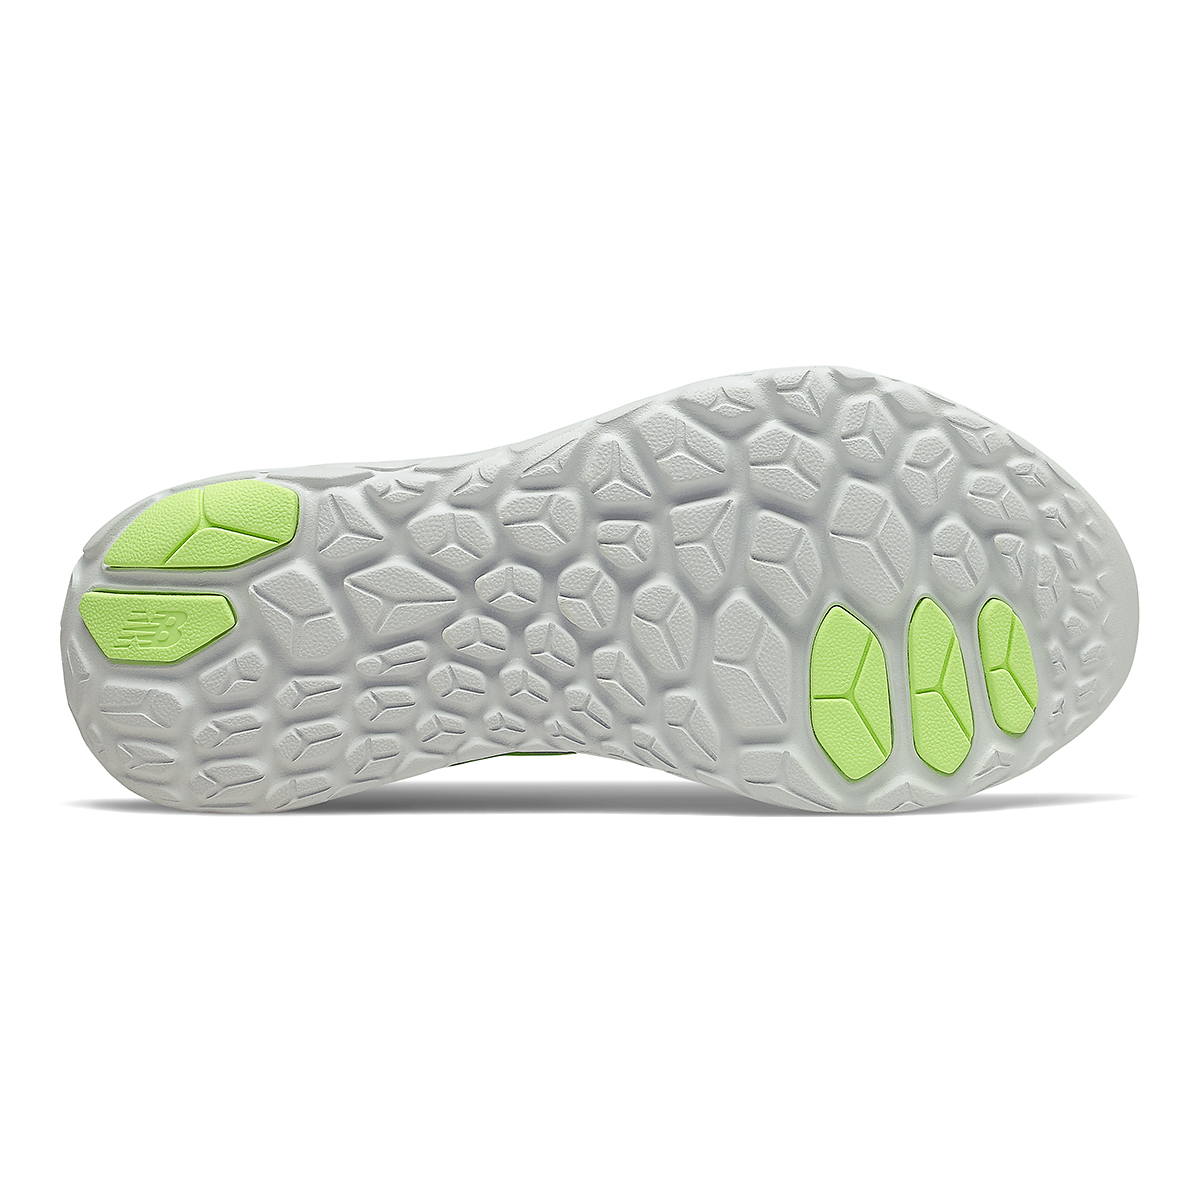 Women's New Balance Beacon V3 Running Shoe - Color: Vivid Coral/Citrus Punch - Size: 5 - Width: Regular, Vivid Coral/Citrus Punch, large, image 4